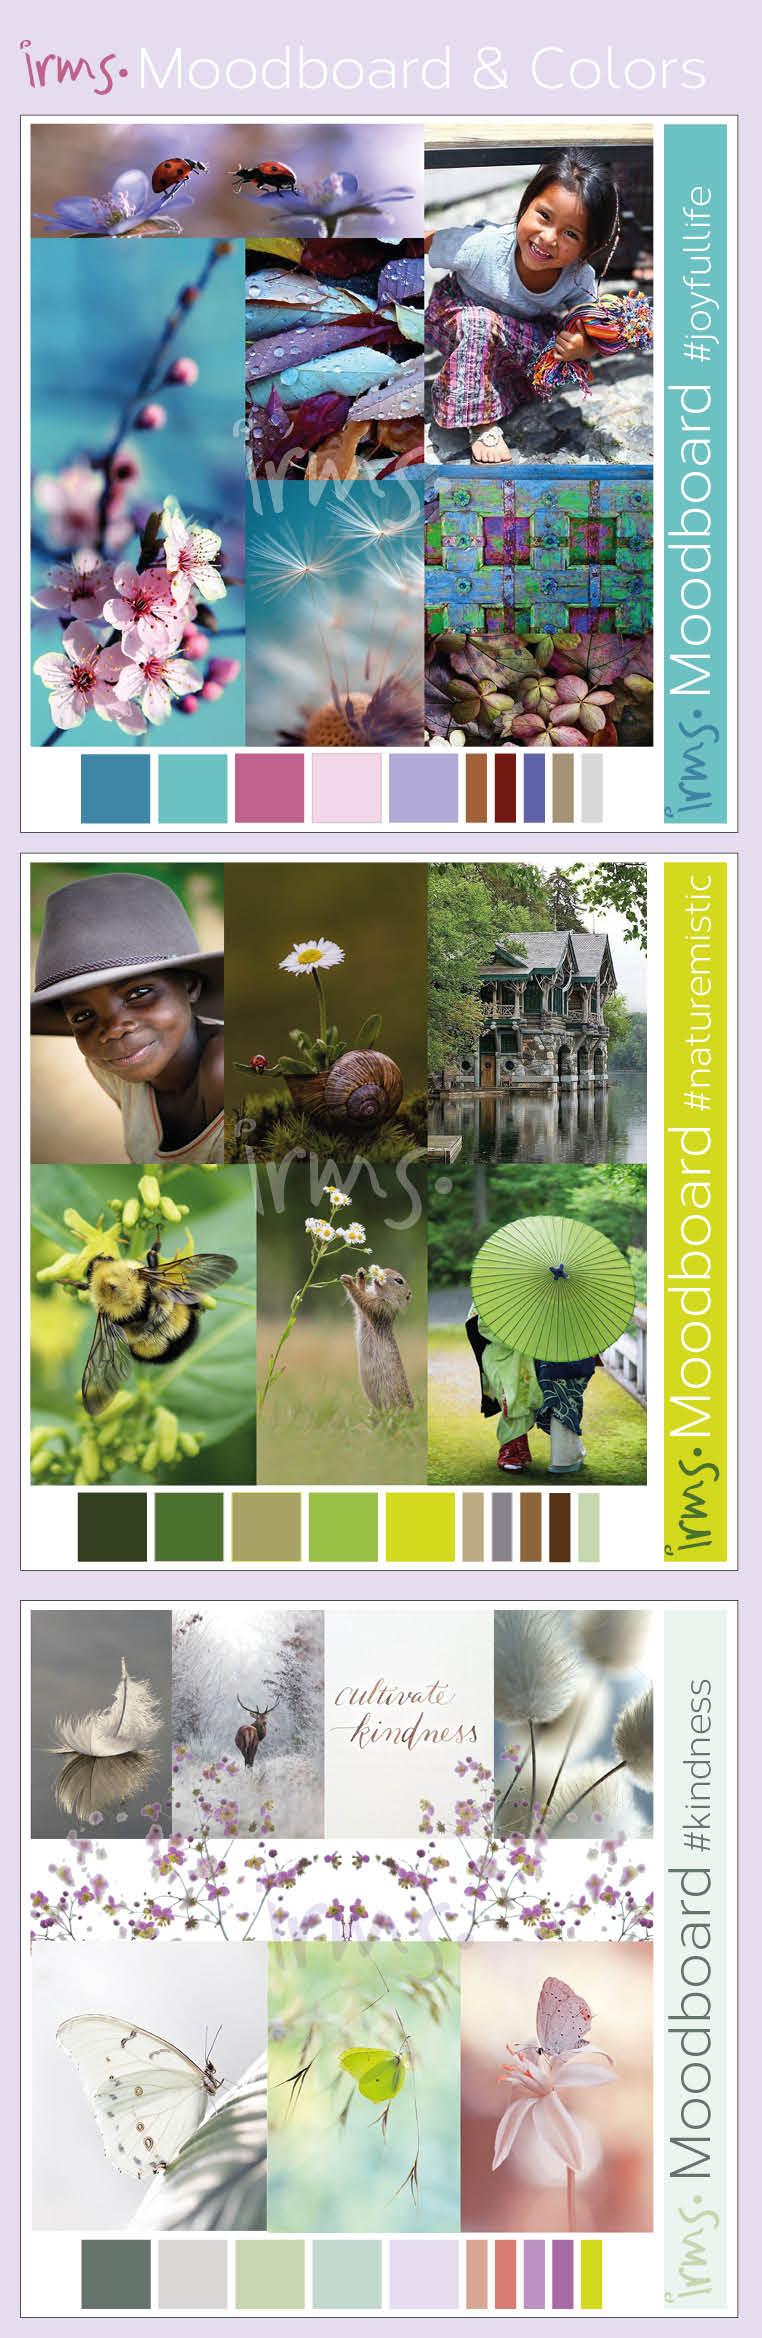 kleurinspiratie-moodboards-homeopathie